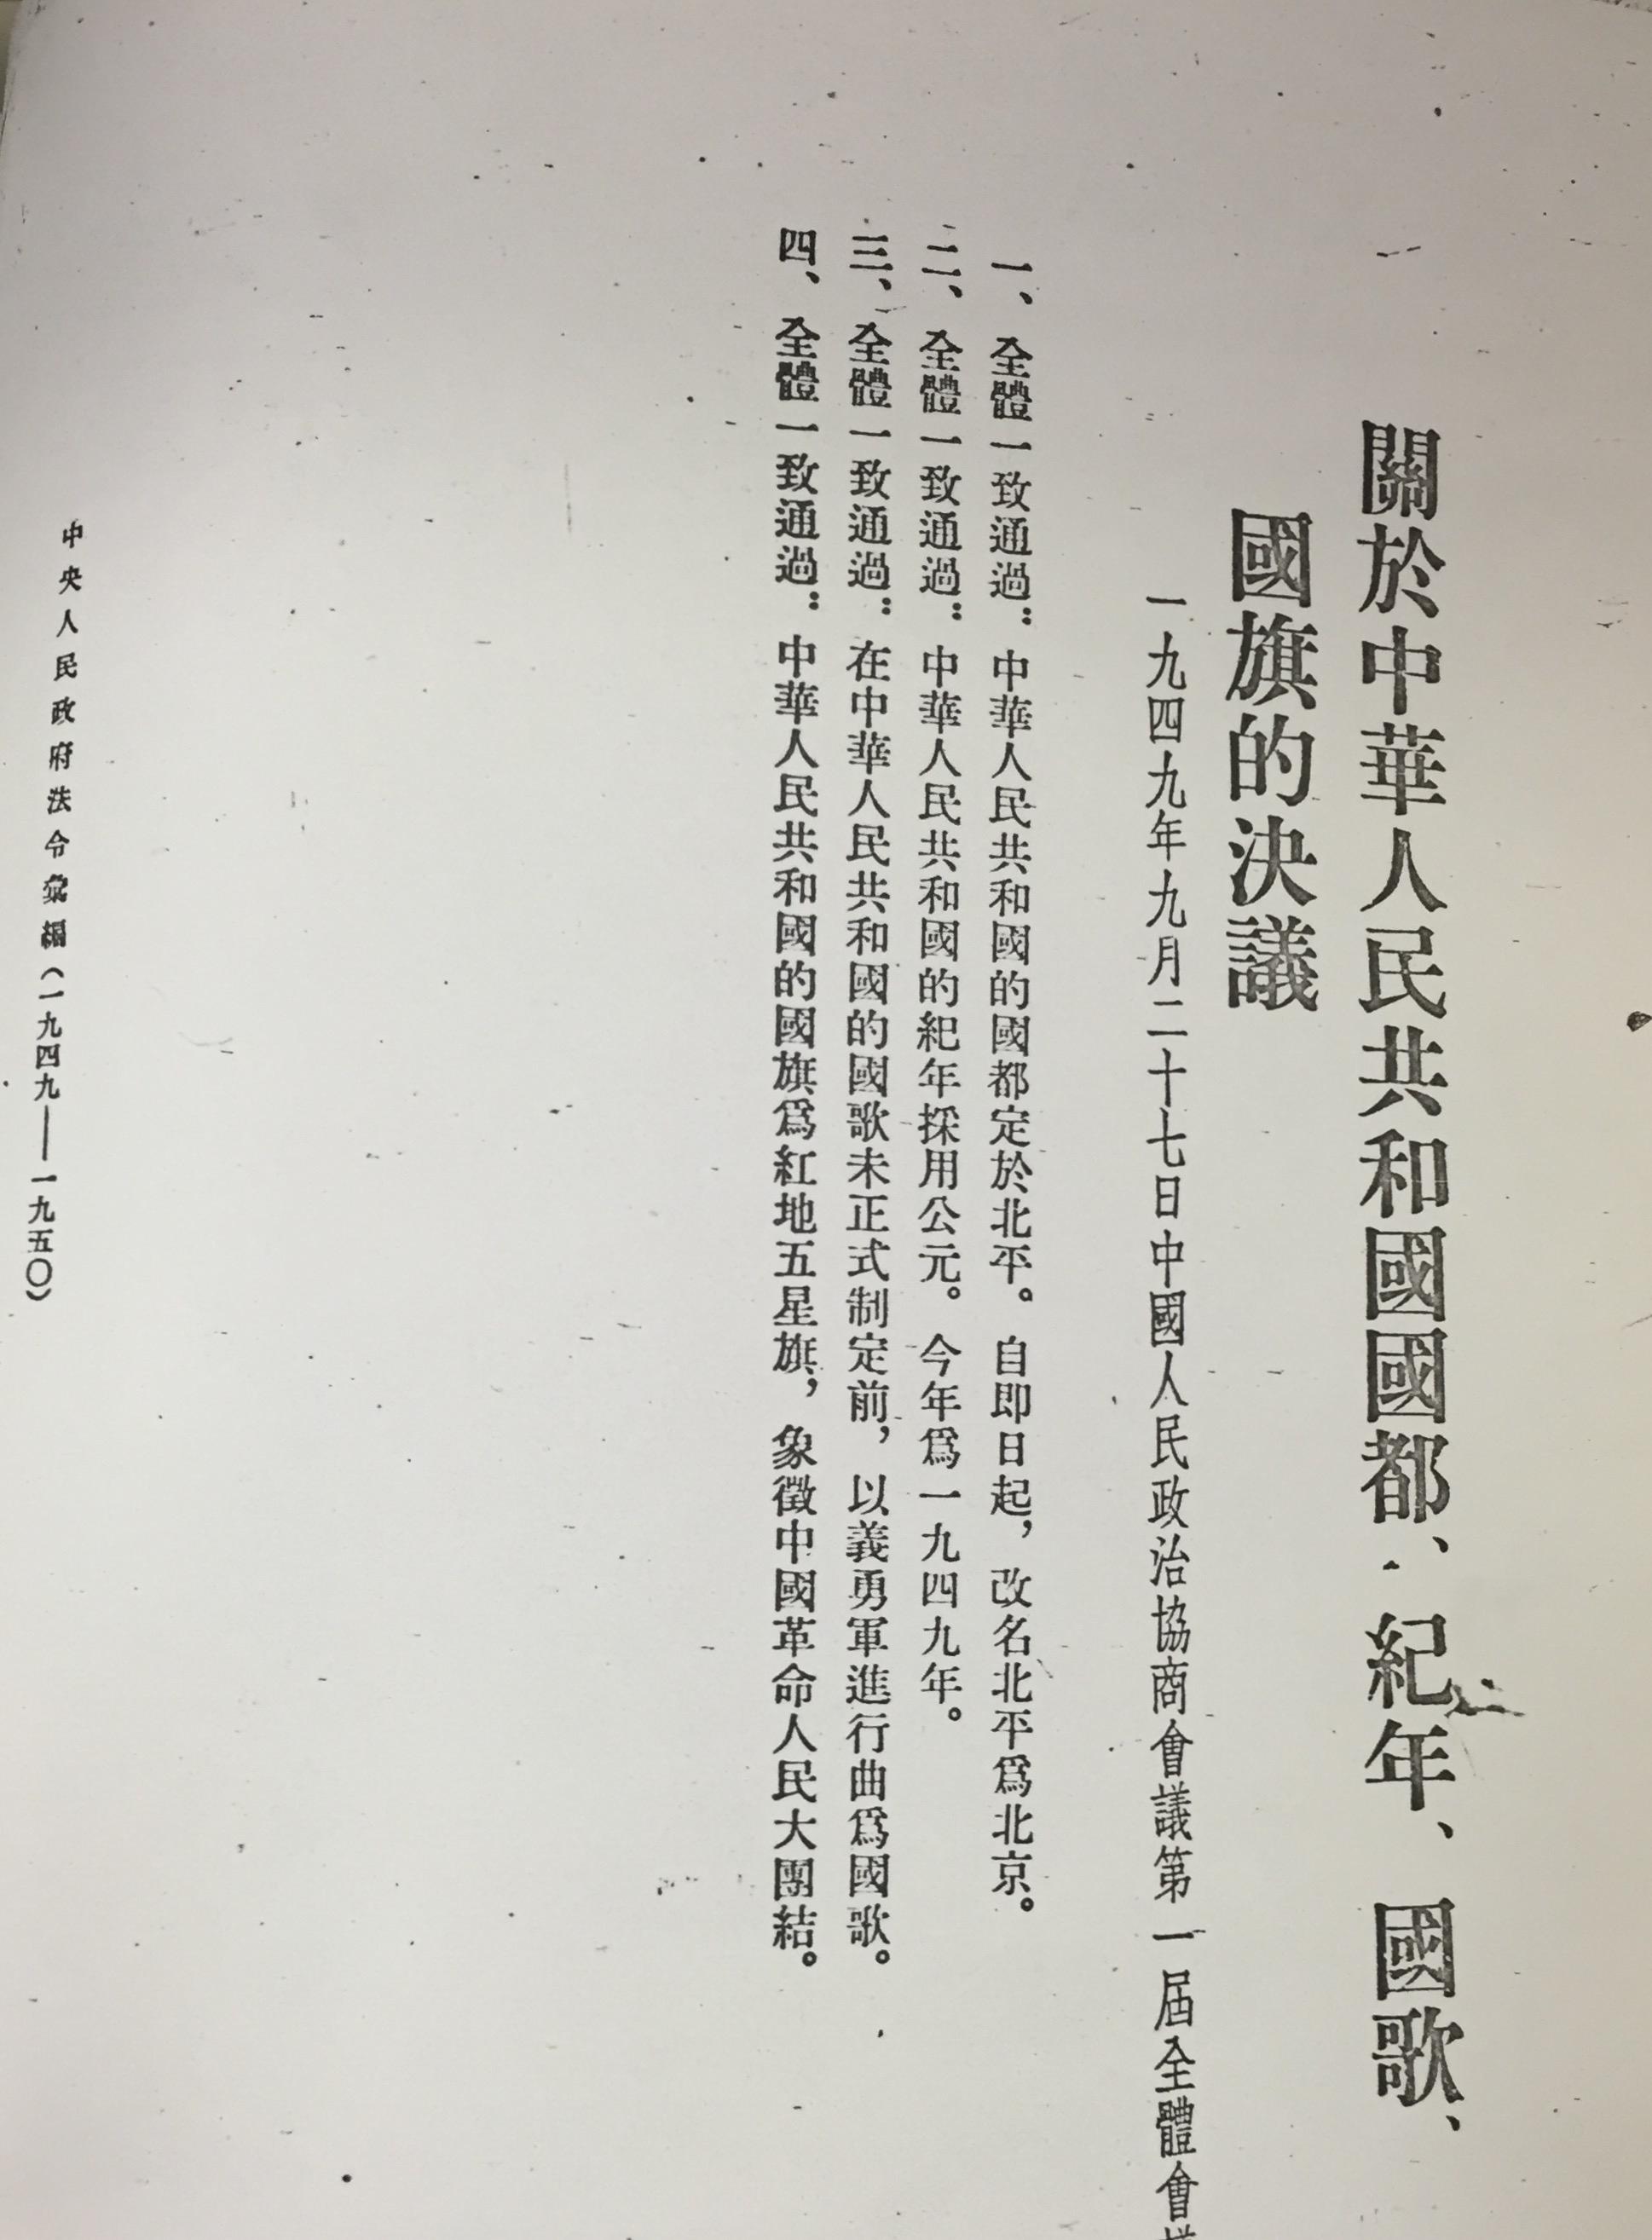 Transition From The Lunar Calendar To The Western Calendar Under inside Gregorian-Chinese Gender Lunar Calendar 2013